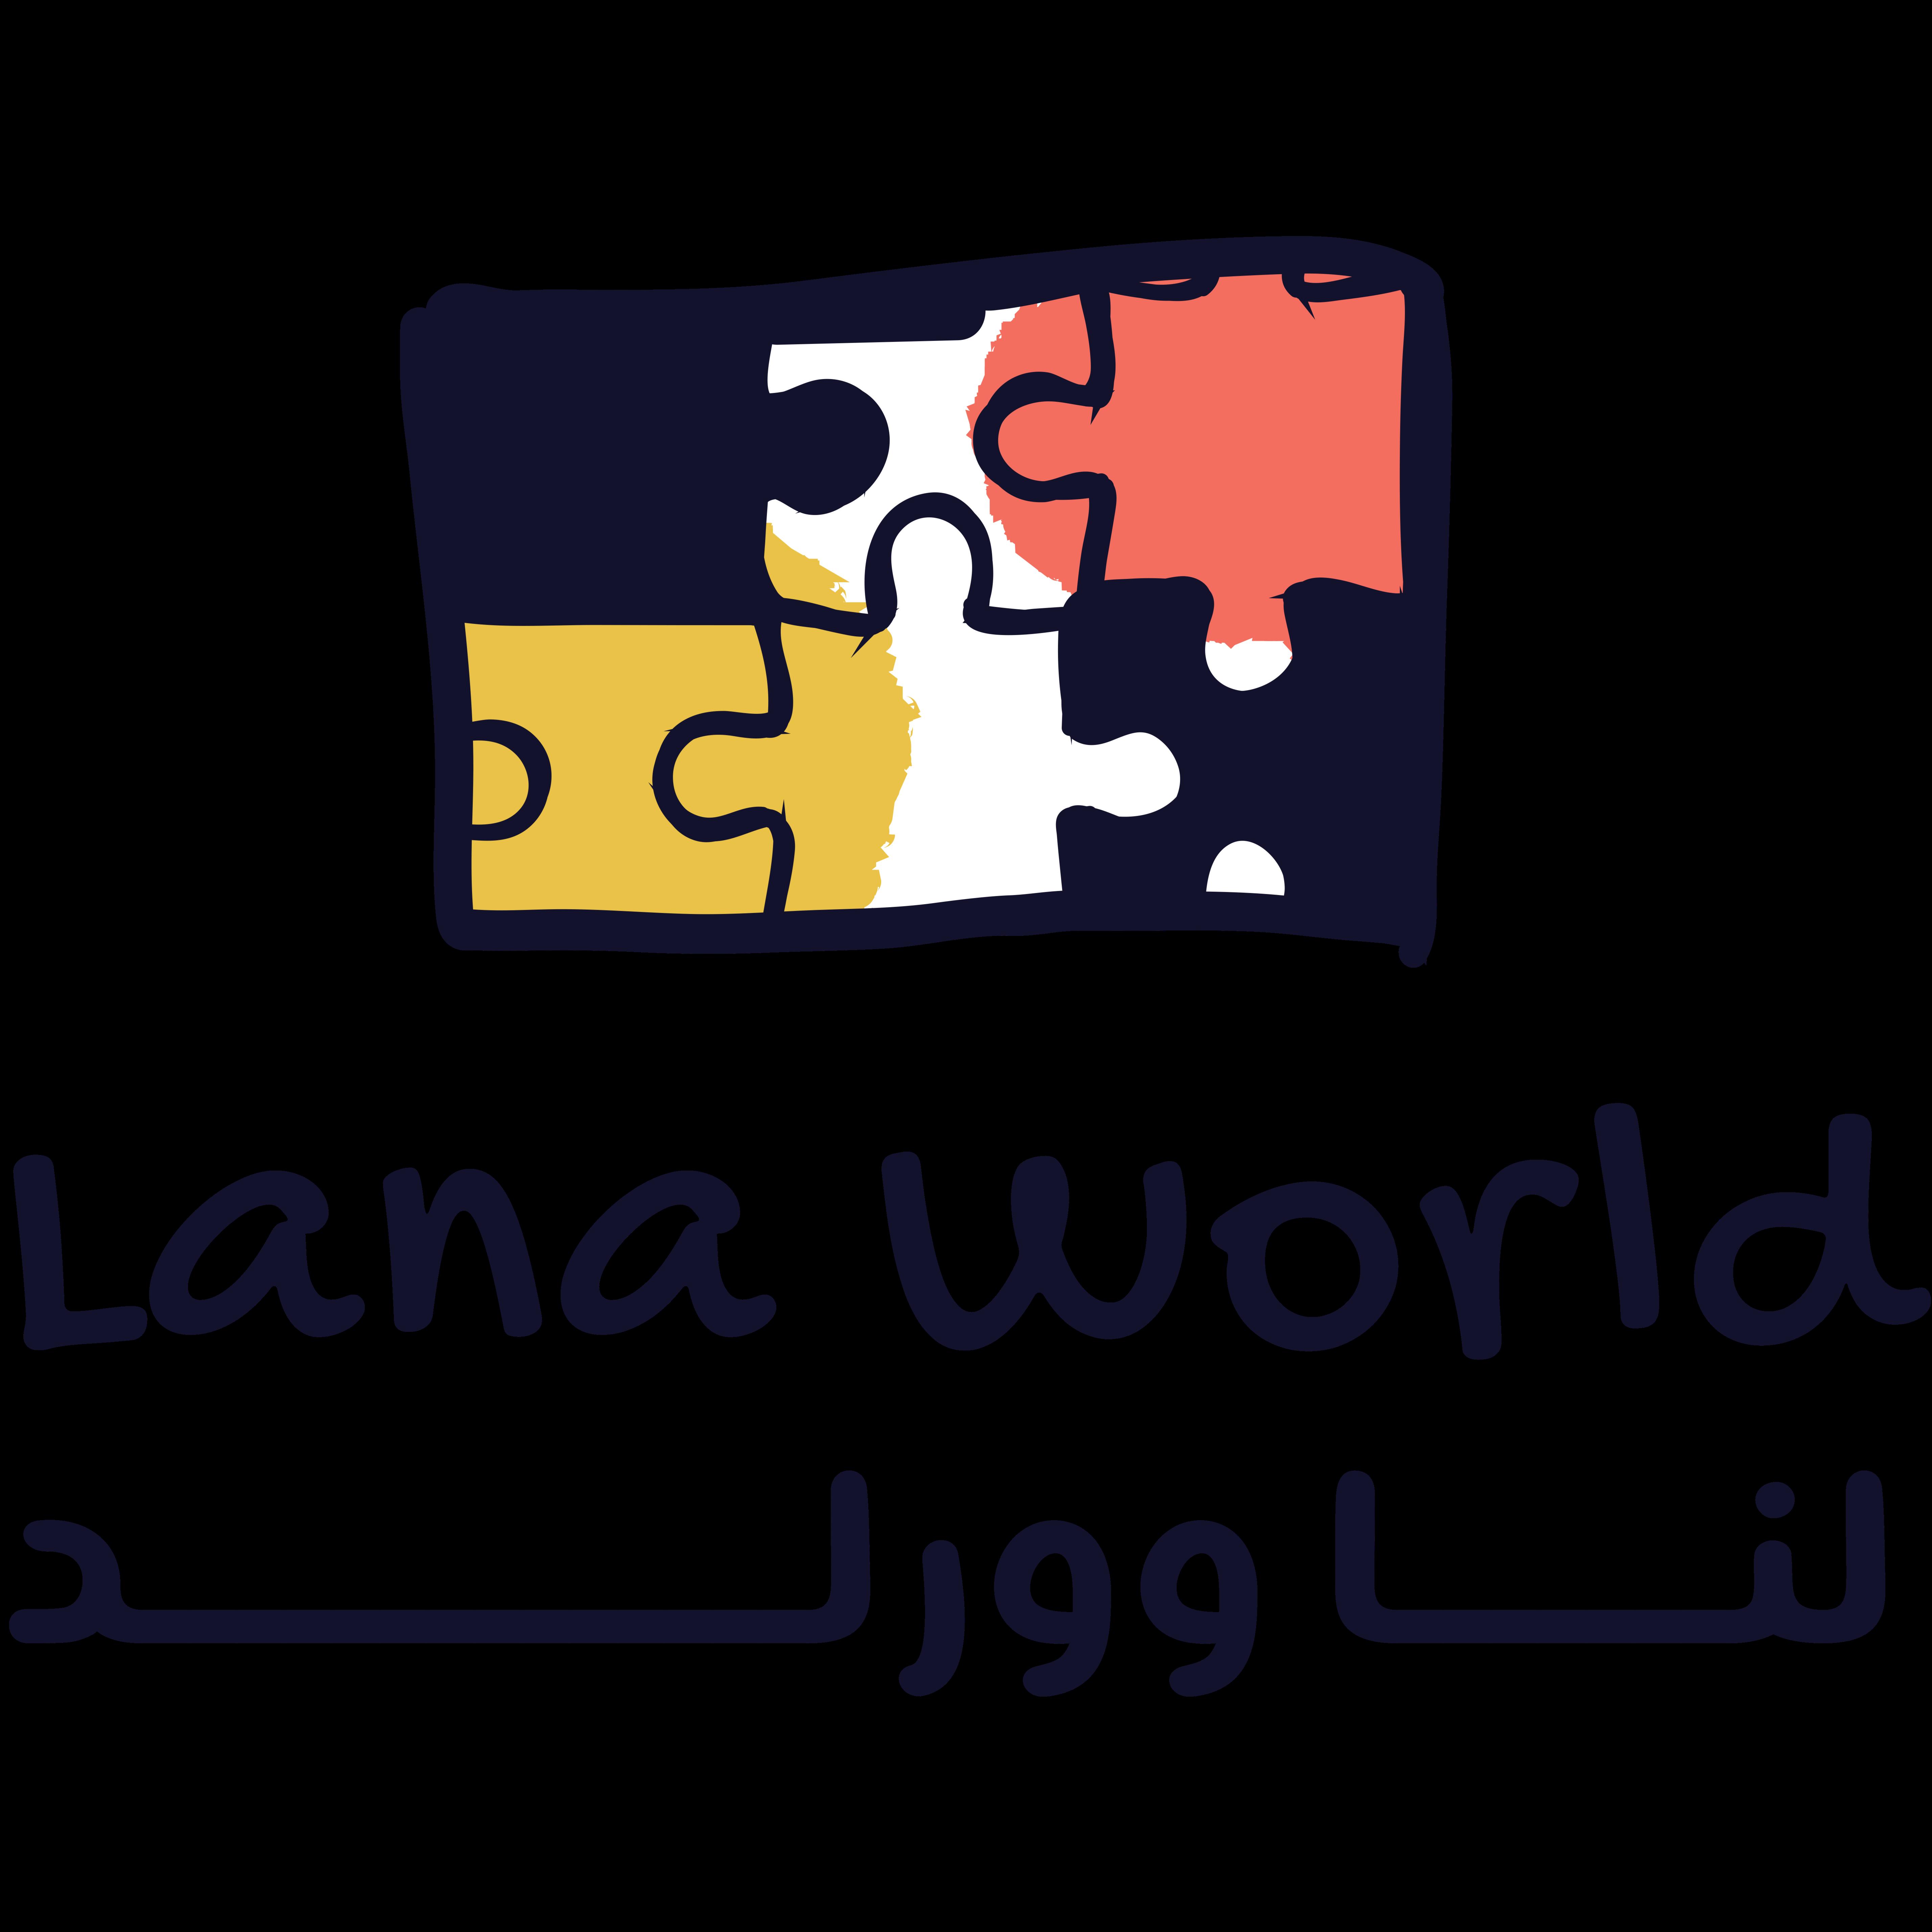 Lana world